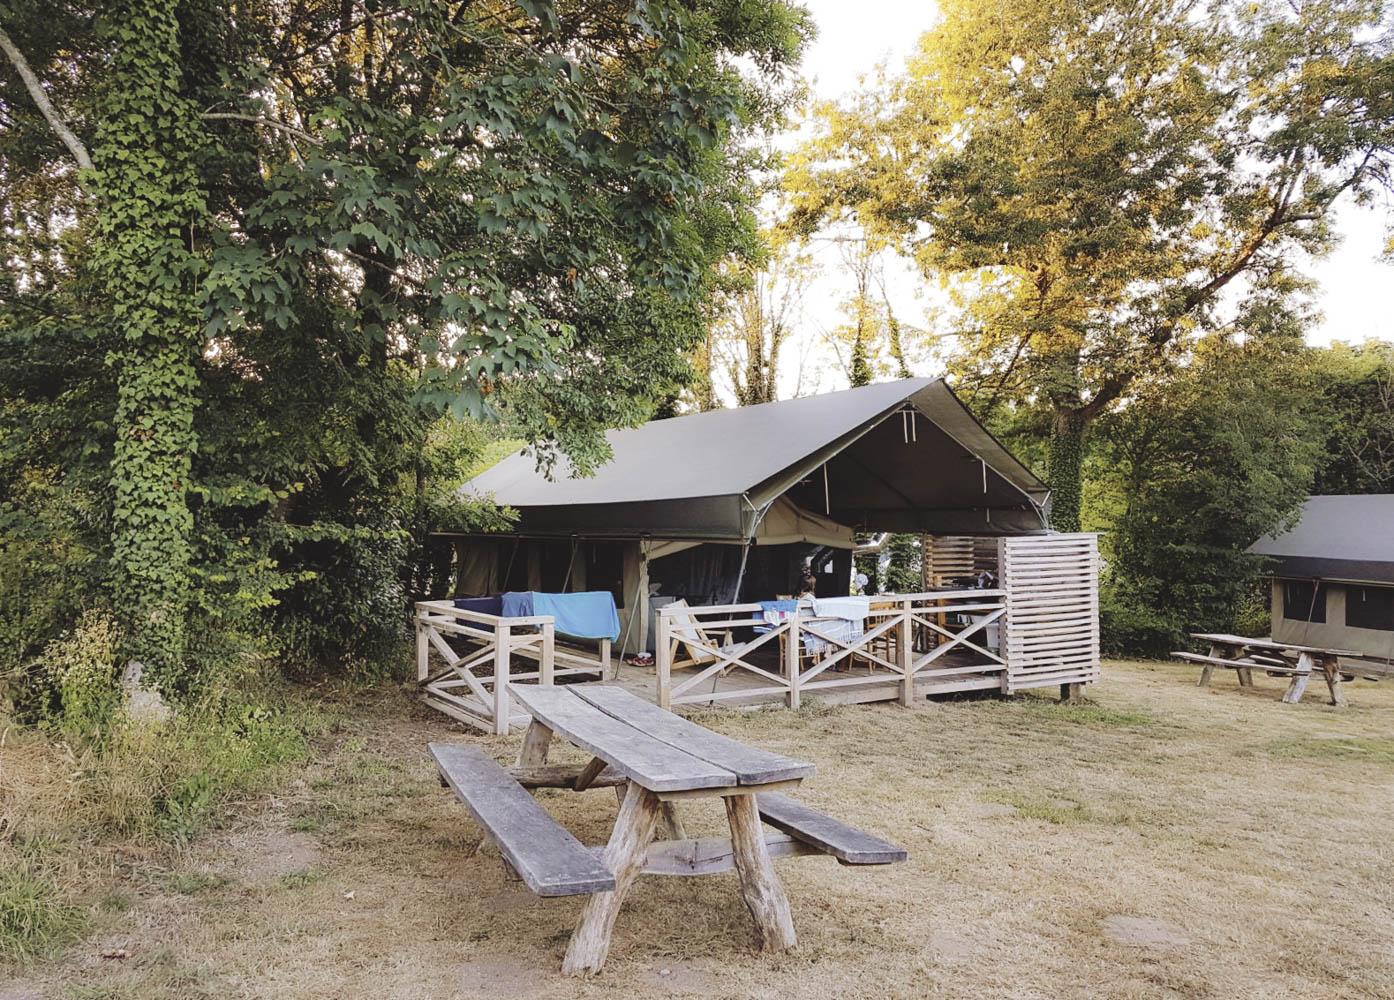 The Archipel Safari tent.